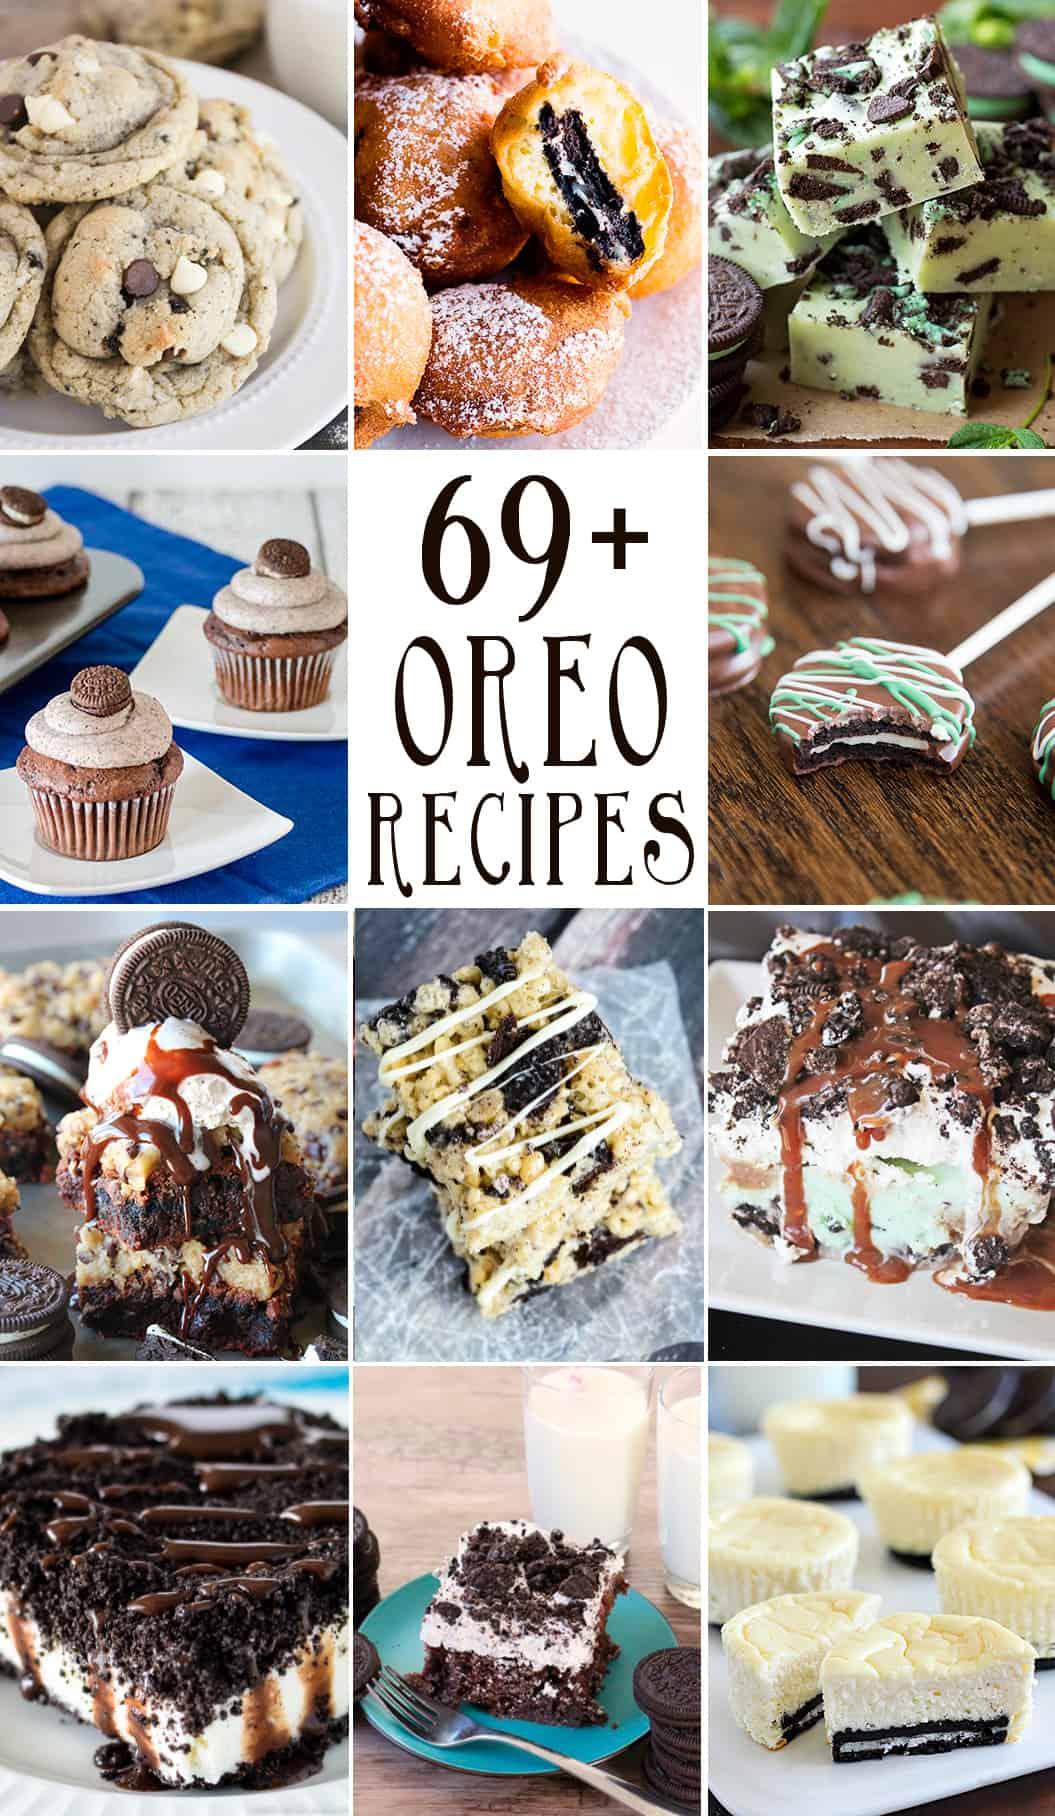 69+ oreo recipes collage